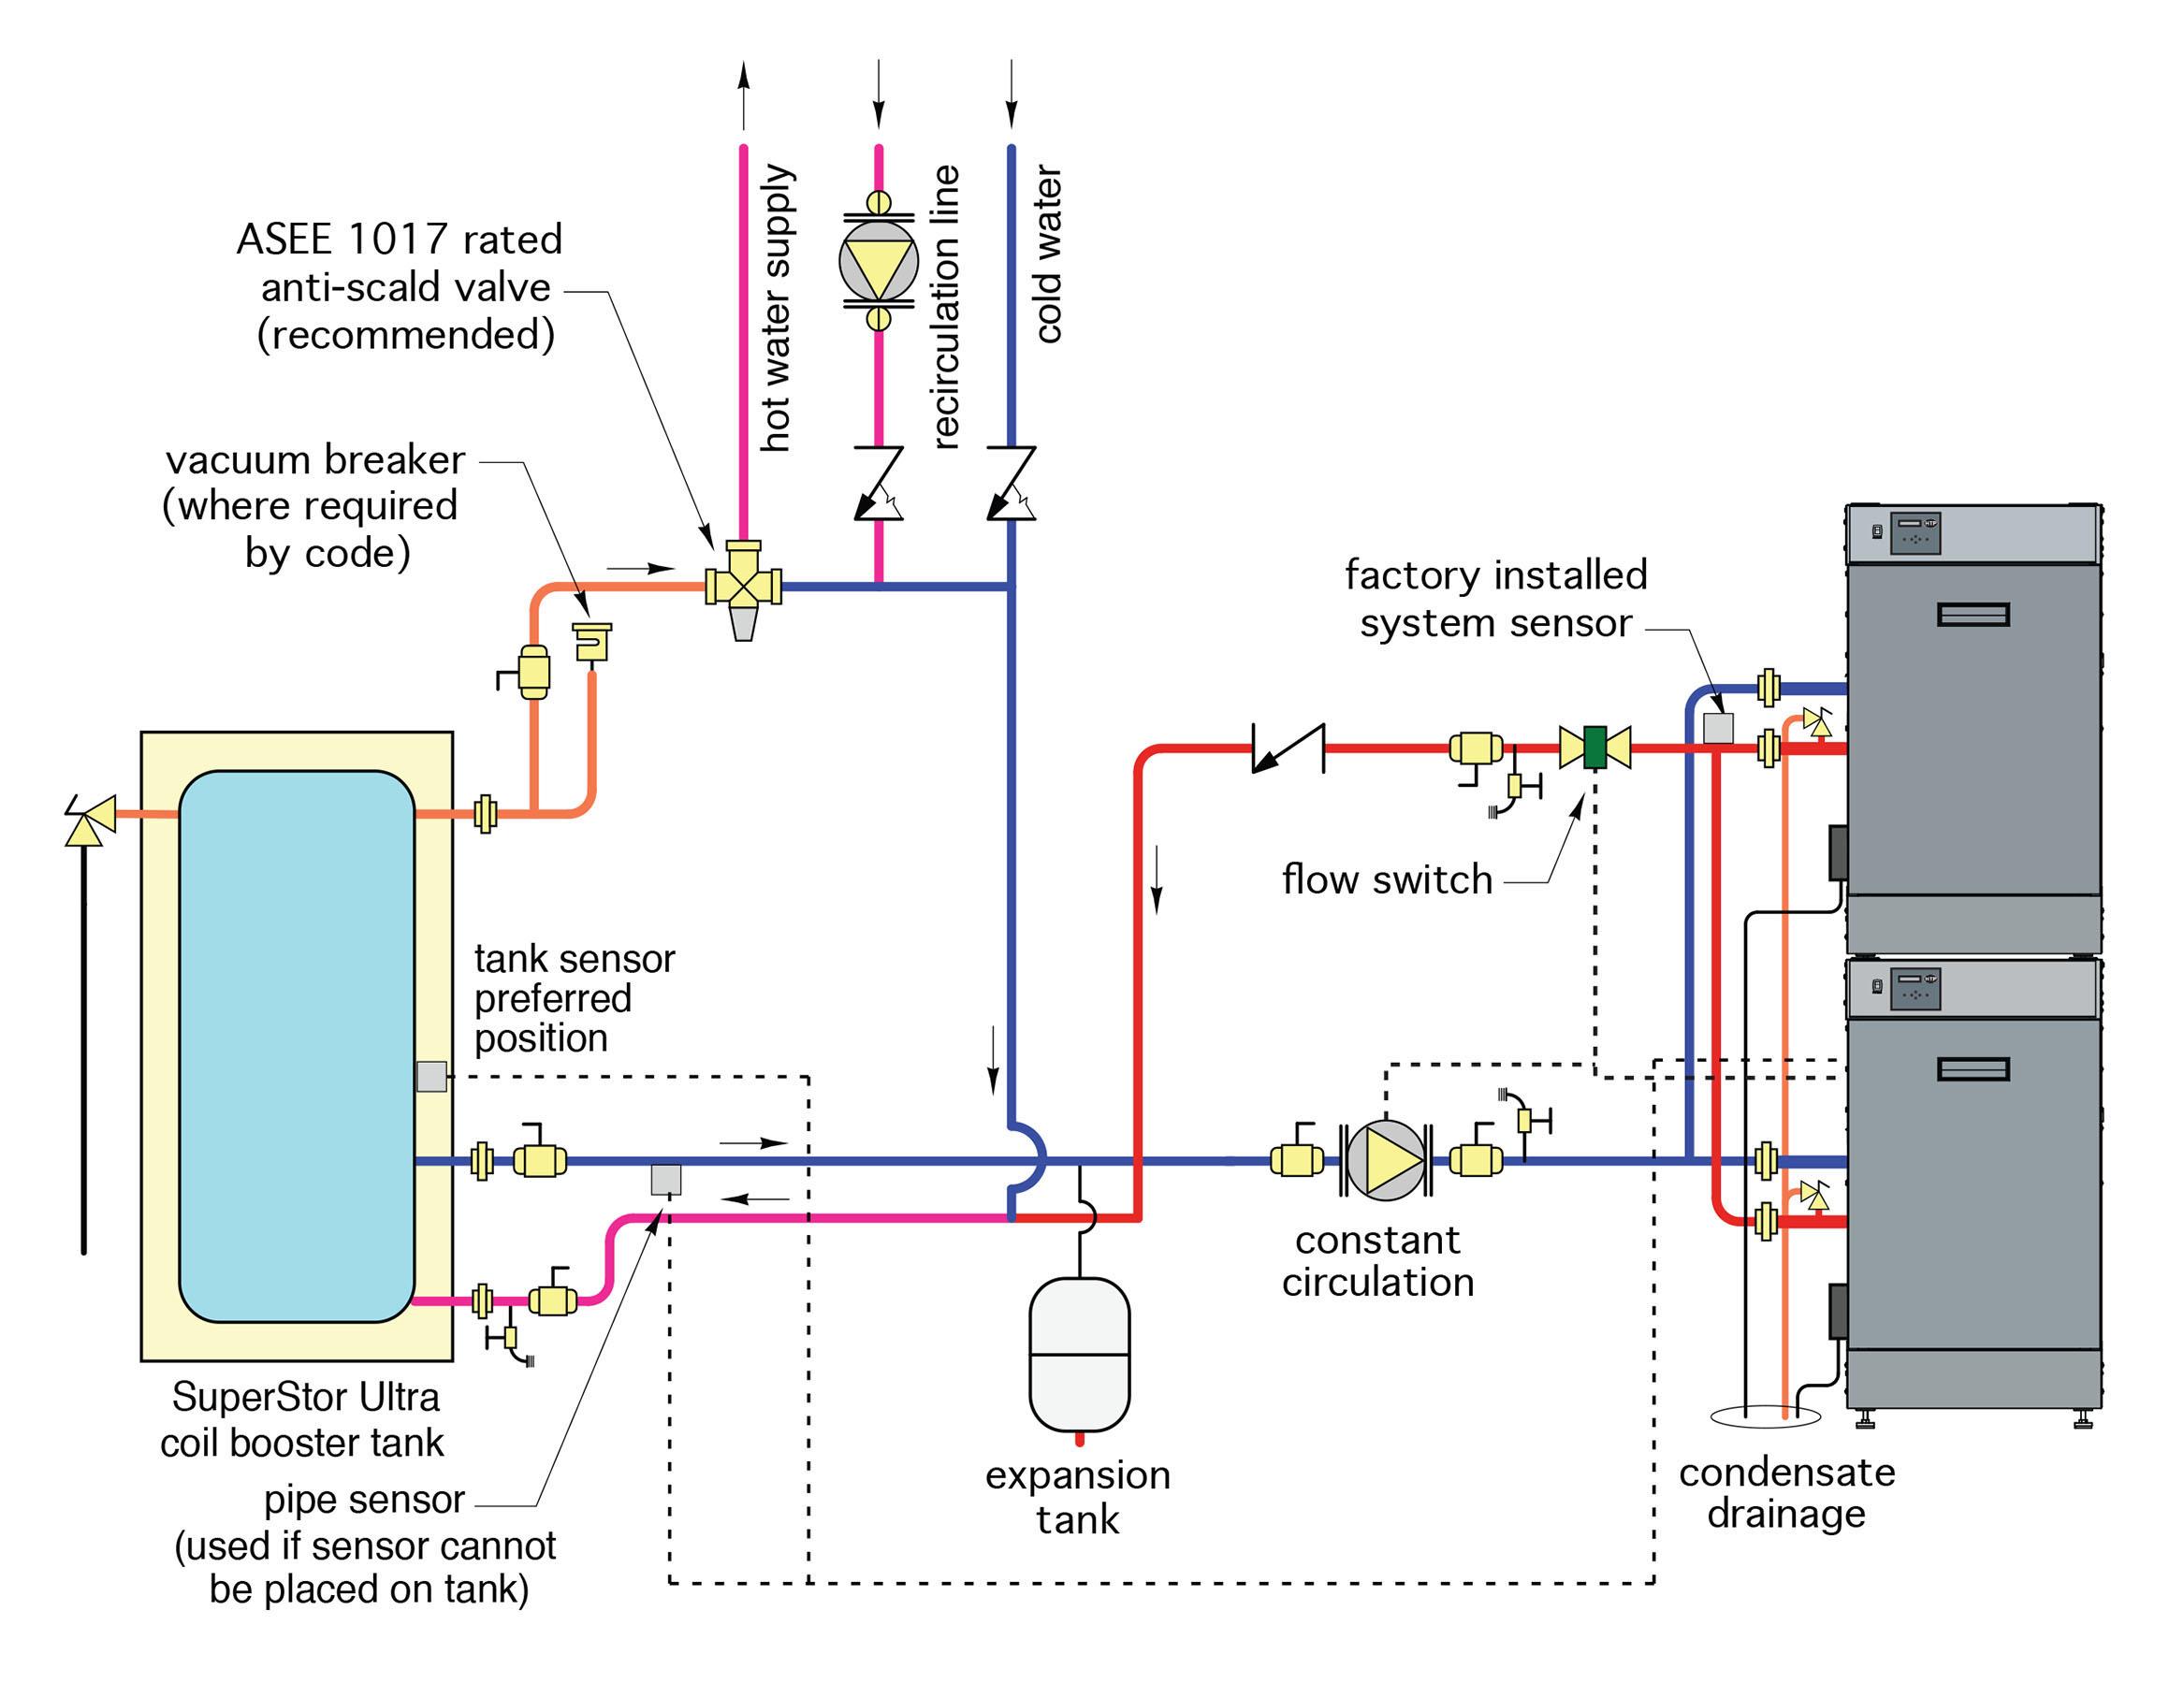 MA_3172] Piping Diagram Hot Water BoilerEopsy Scoba Mohammedshrine Librar Wiring 101